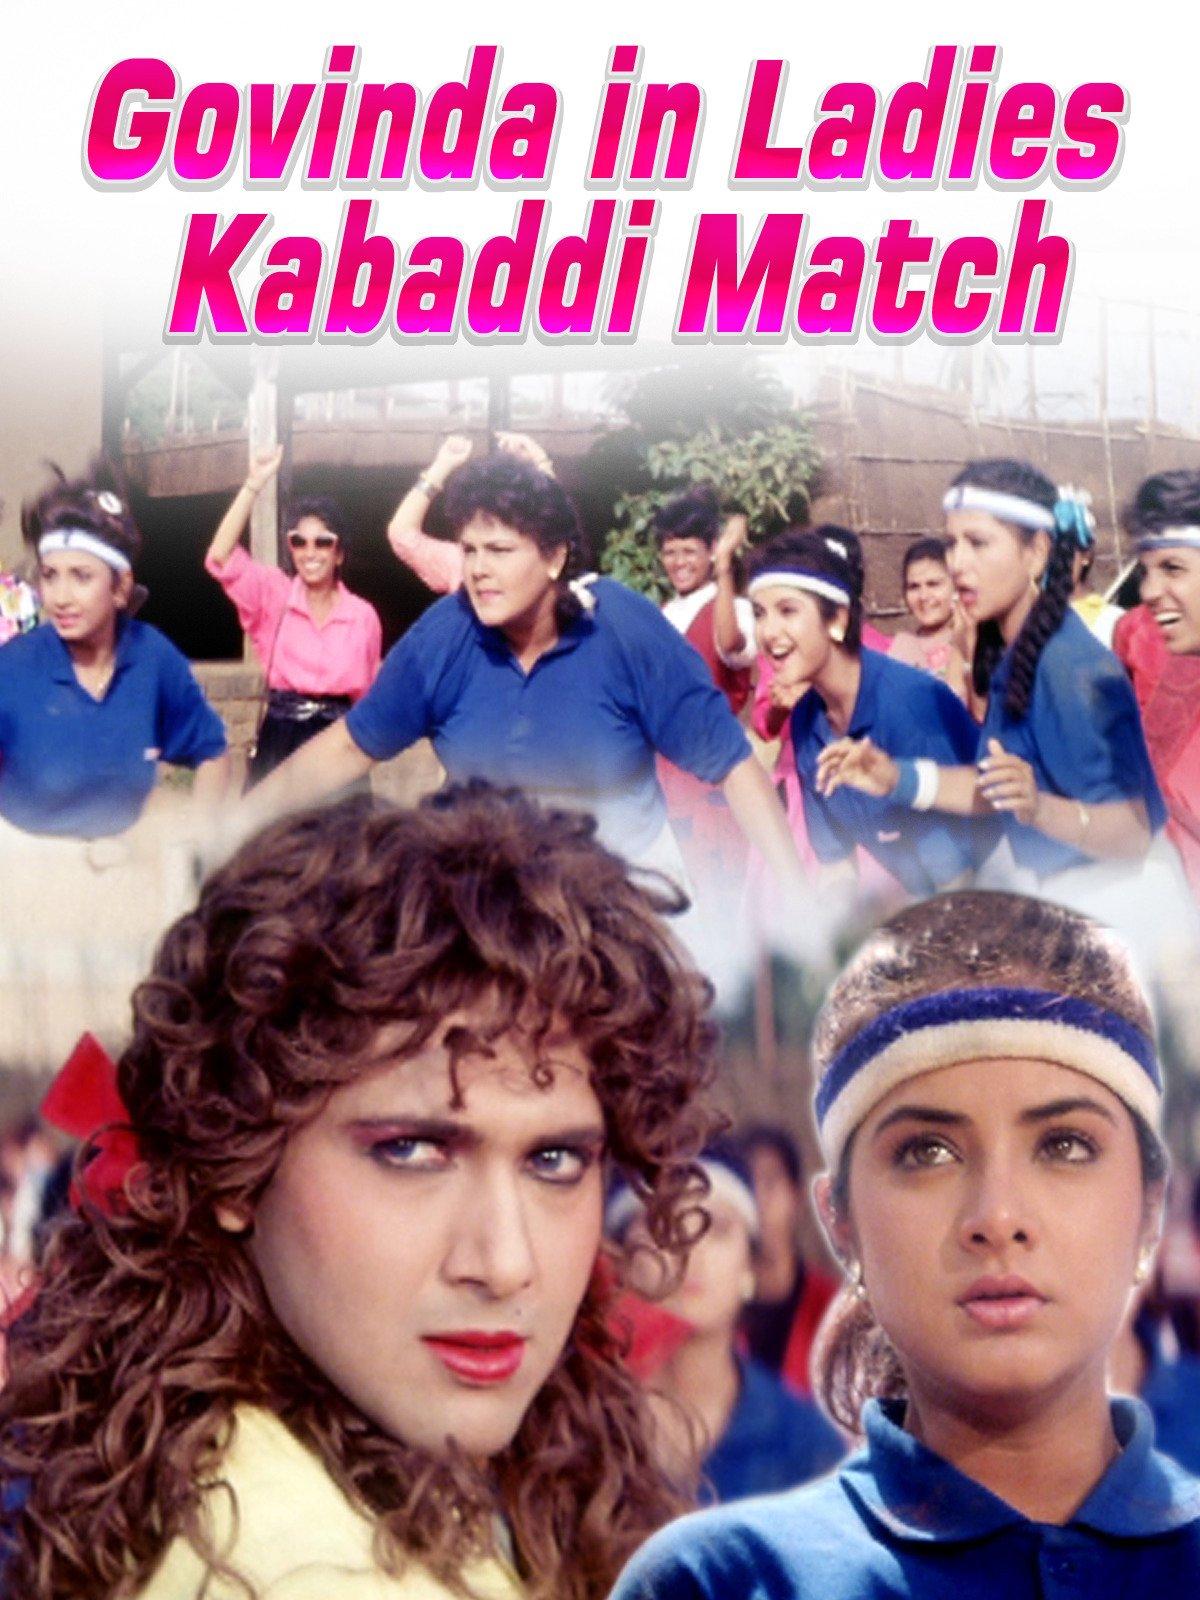 Clip: Govinda In Ladies Kabaddi Match